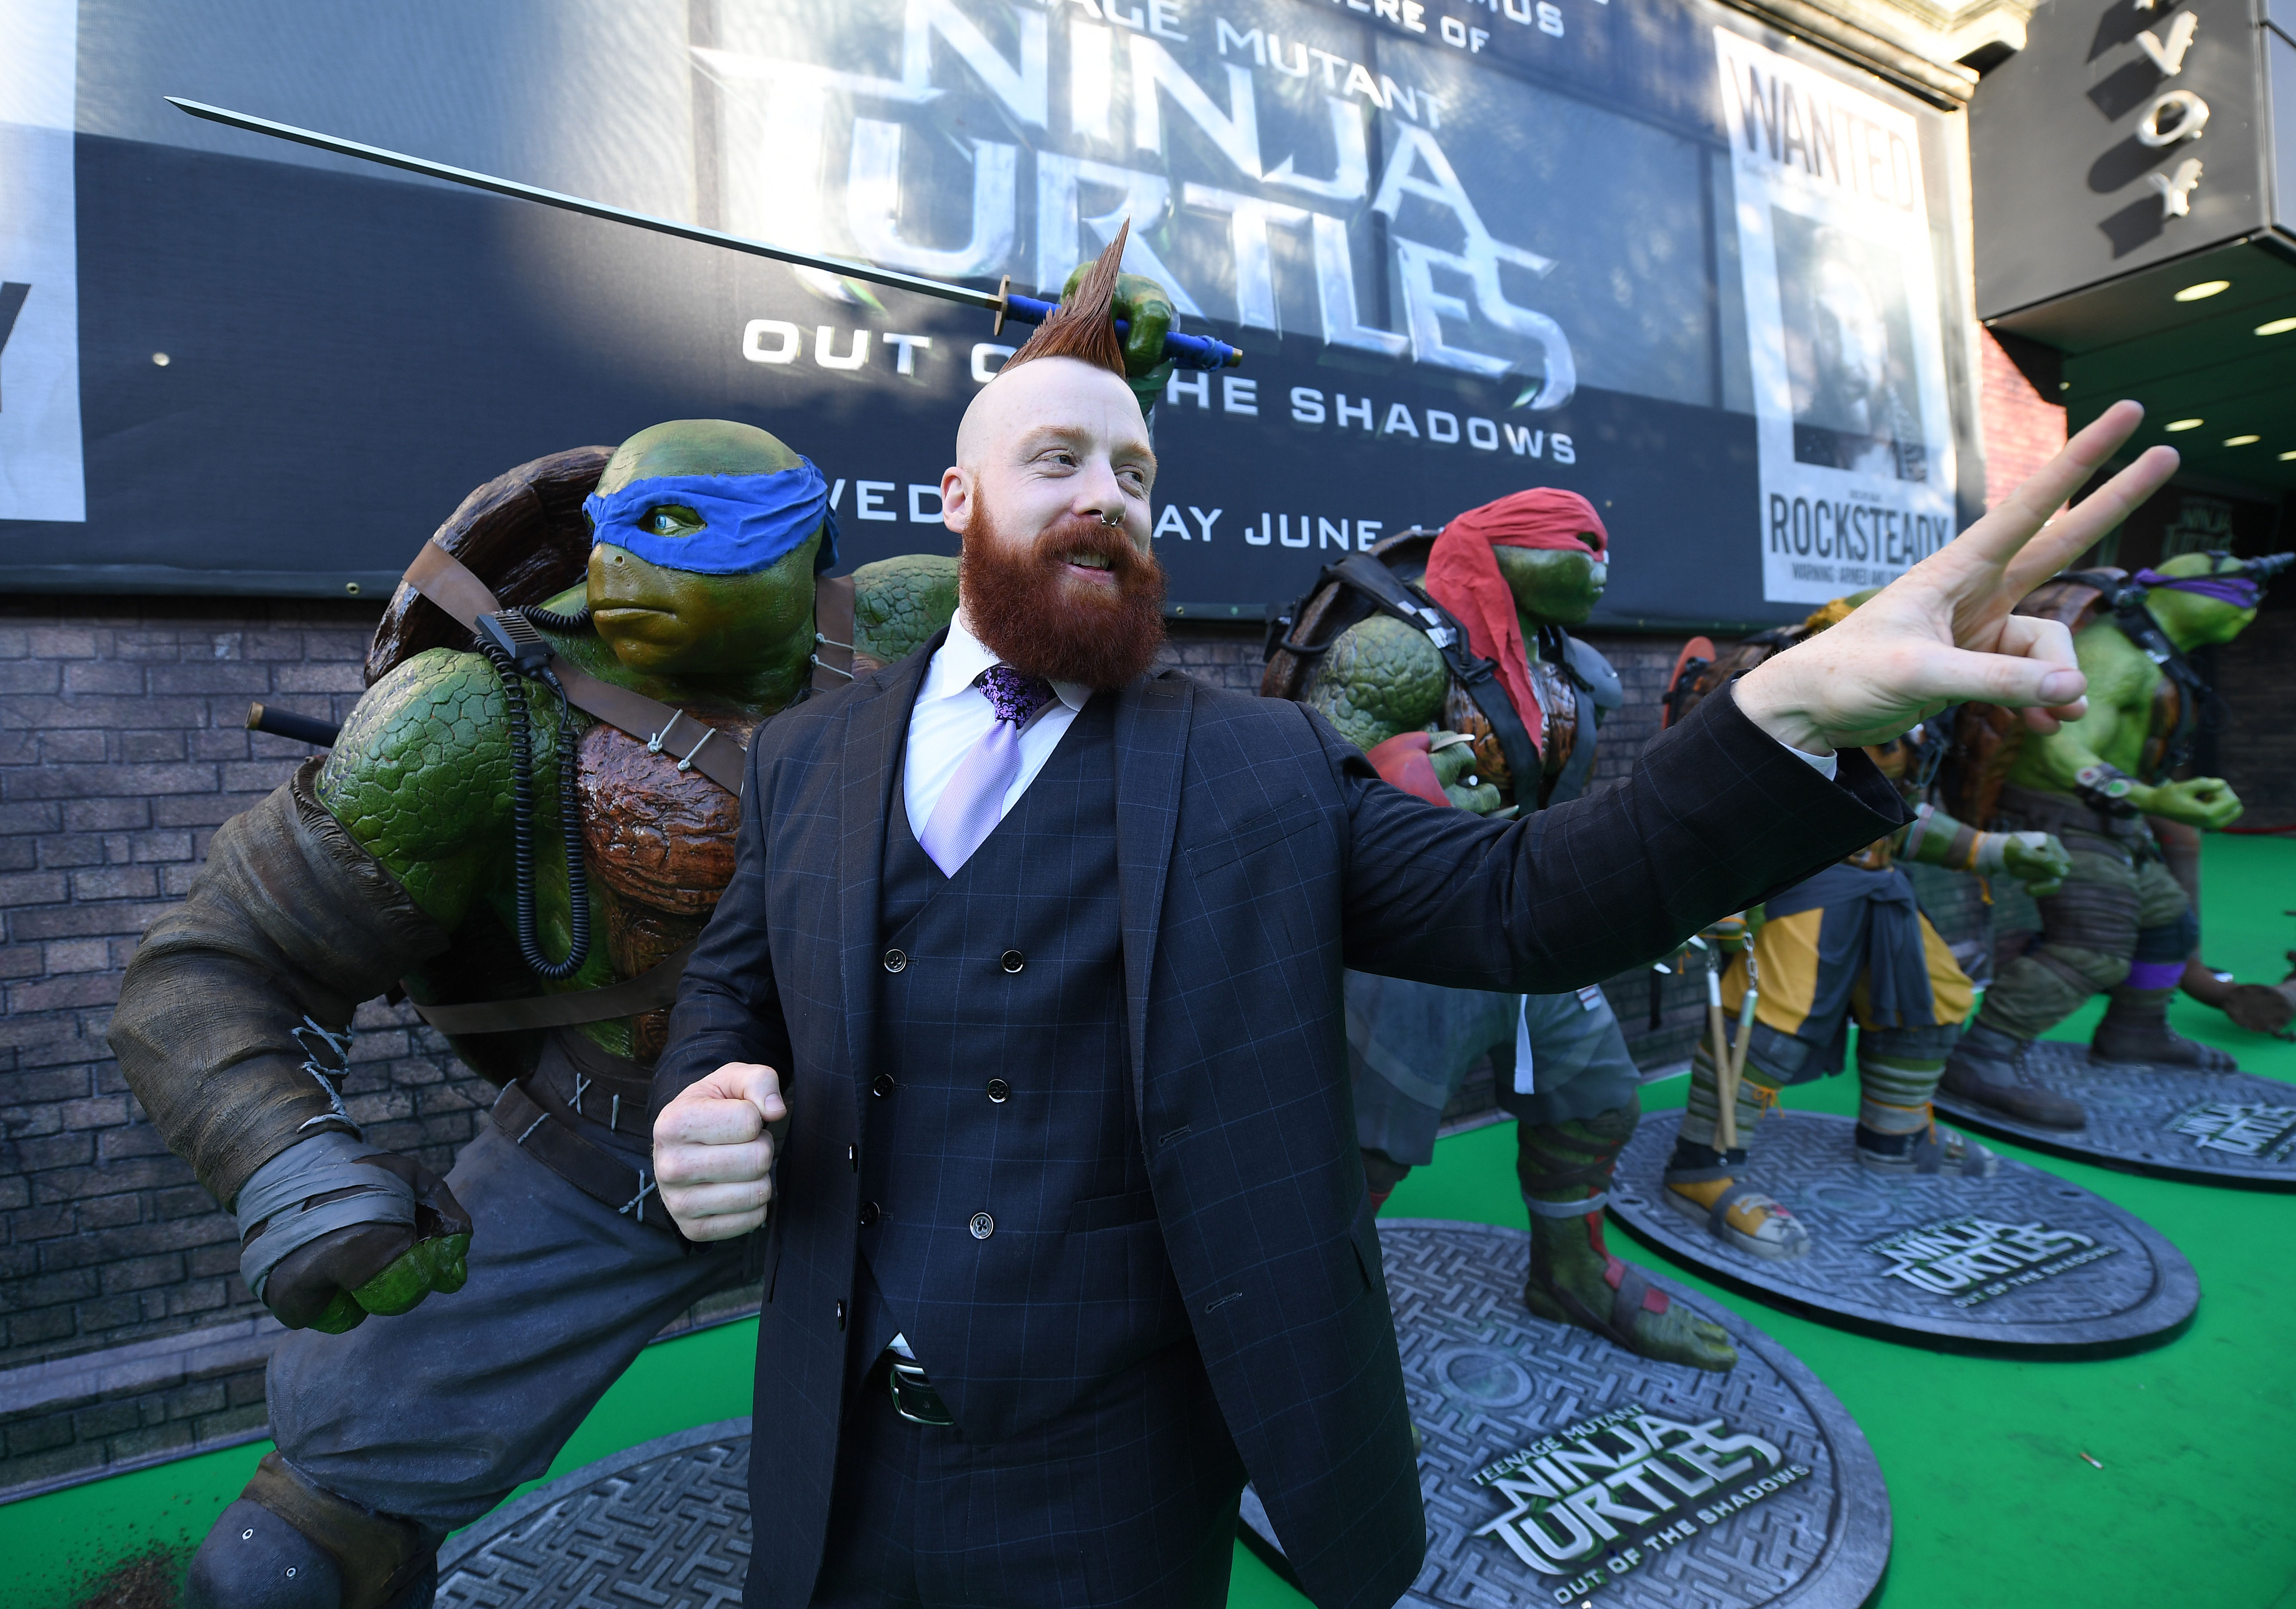 Teenage Mutant Ninja Turtles: Out Of The Shadows Dublin Premiere